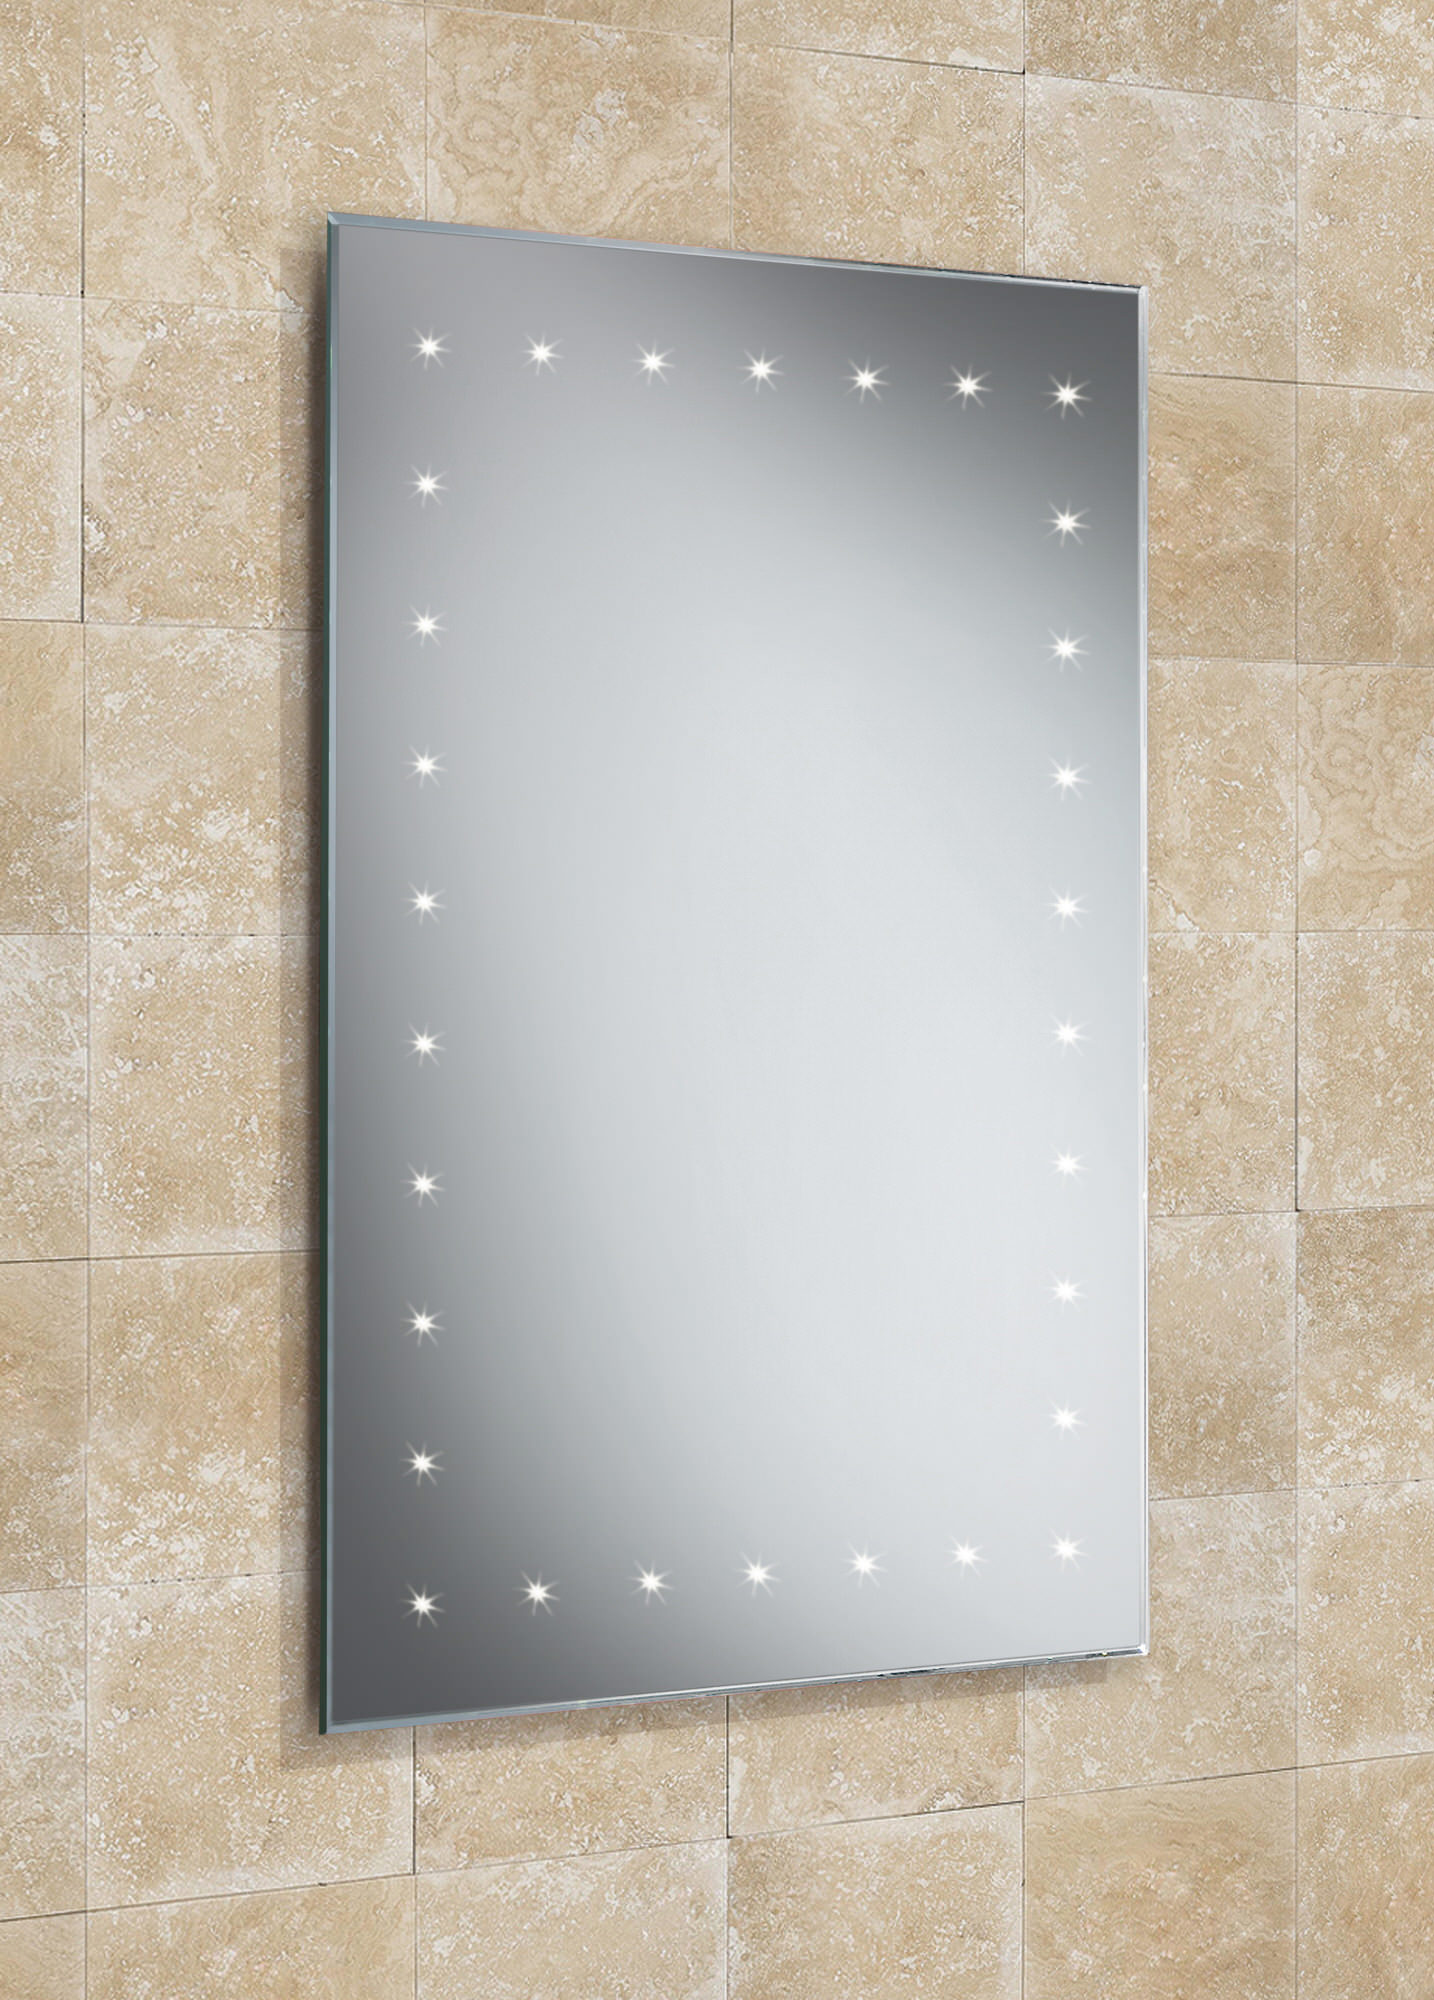 HIB Solar Bevelled Edge Bathroom Mirror With LED Border 500 X 720mm